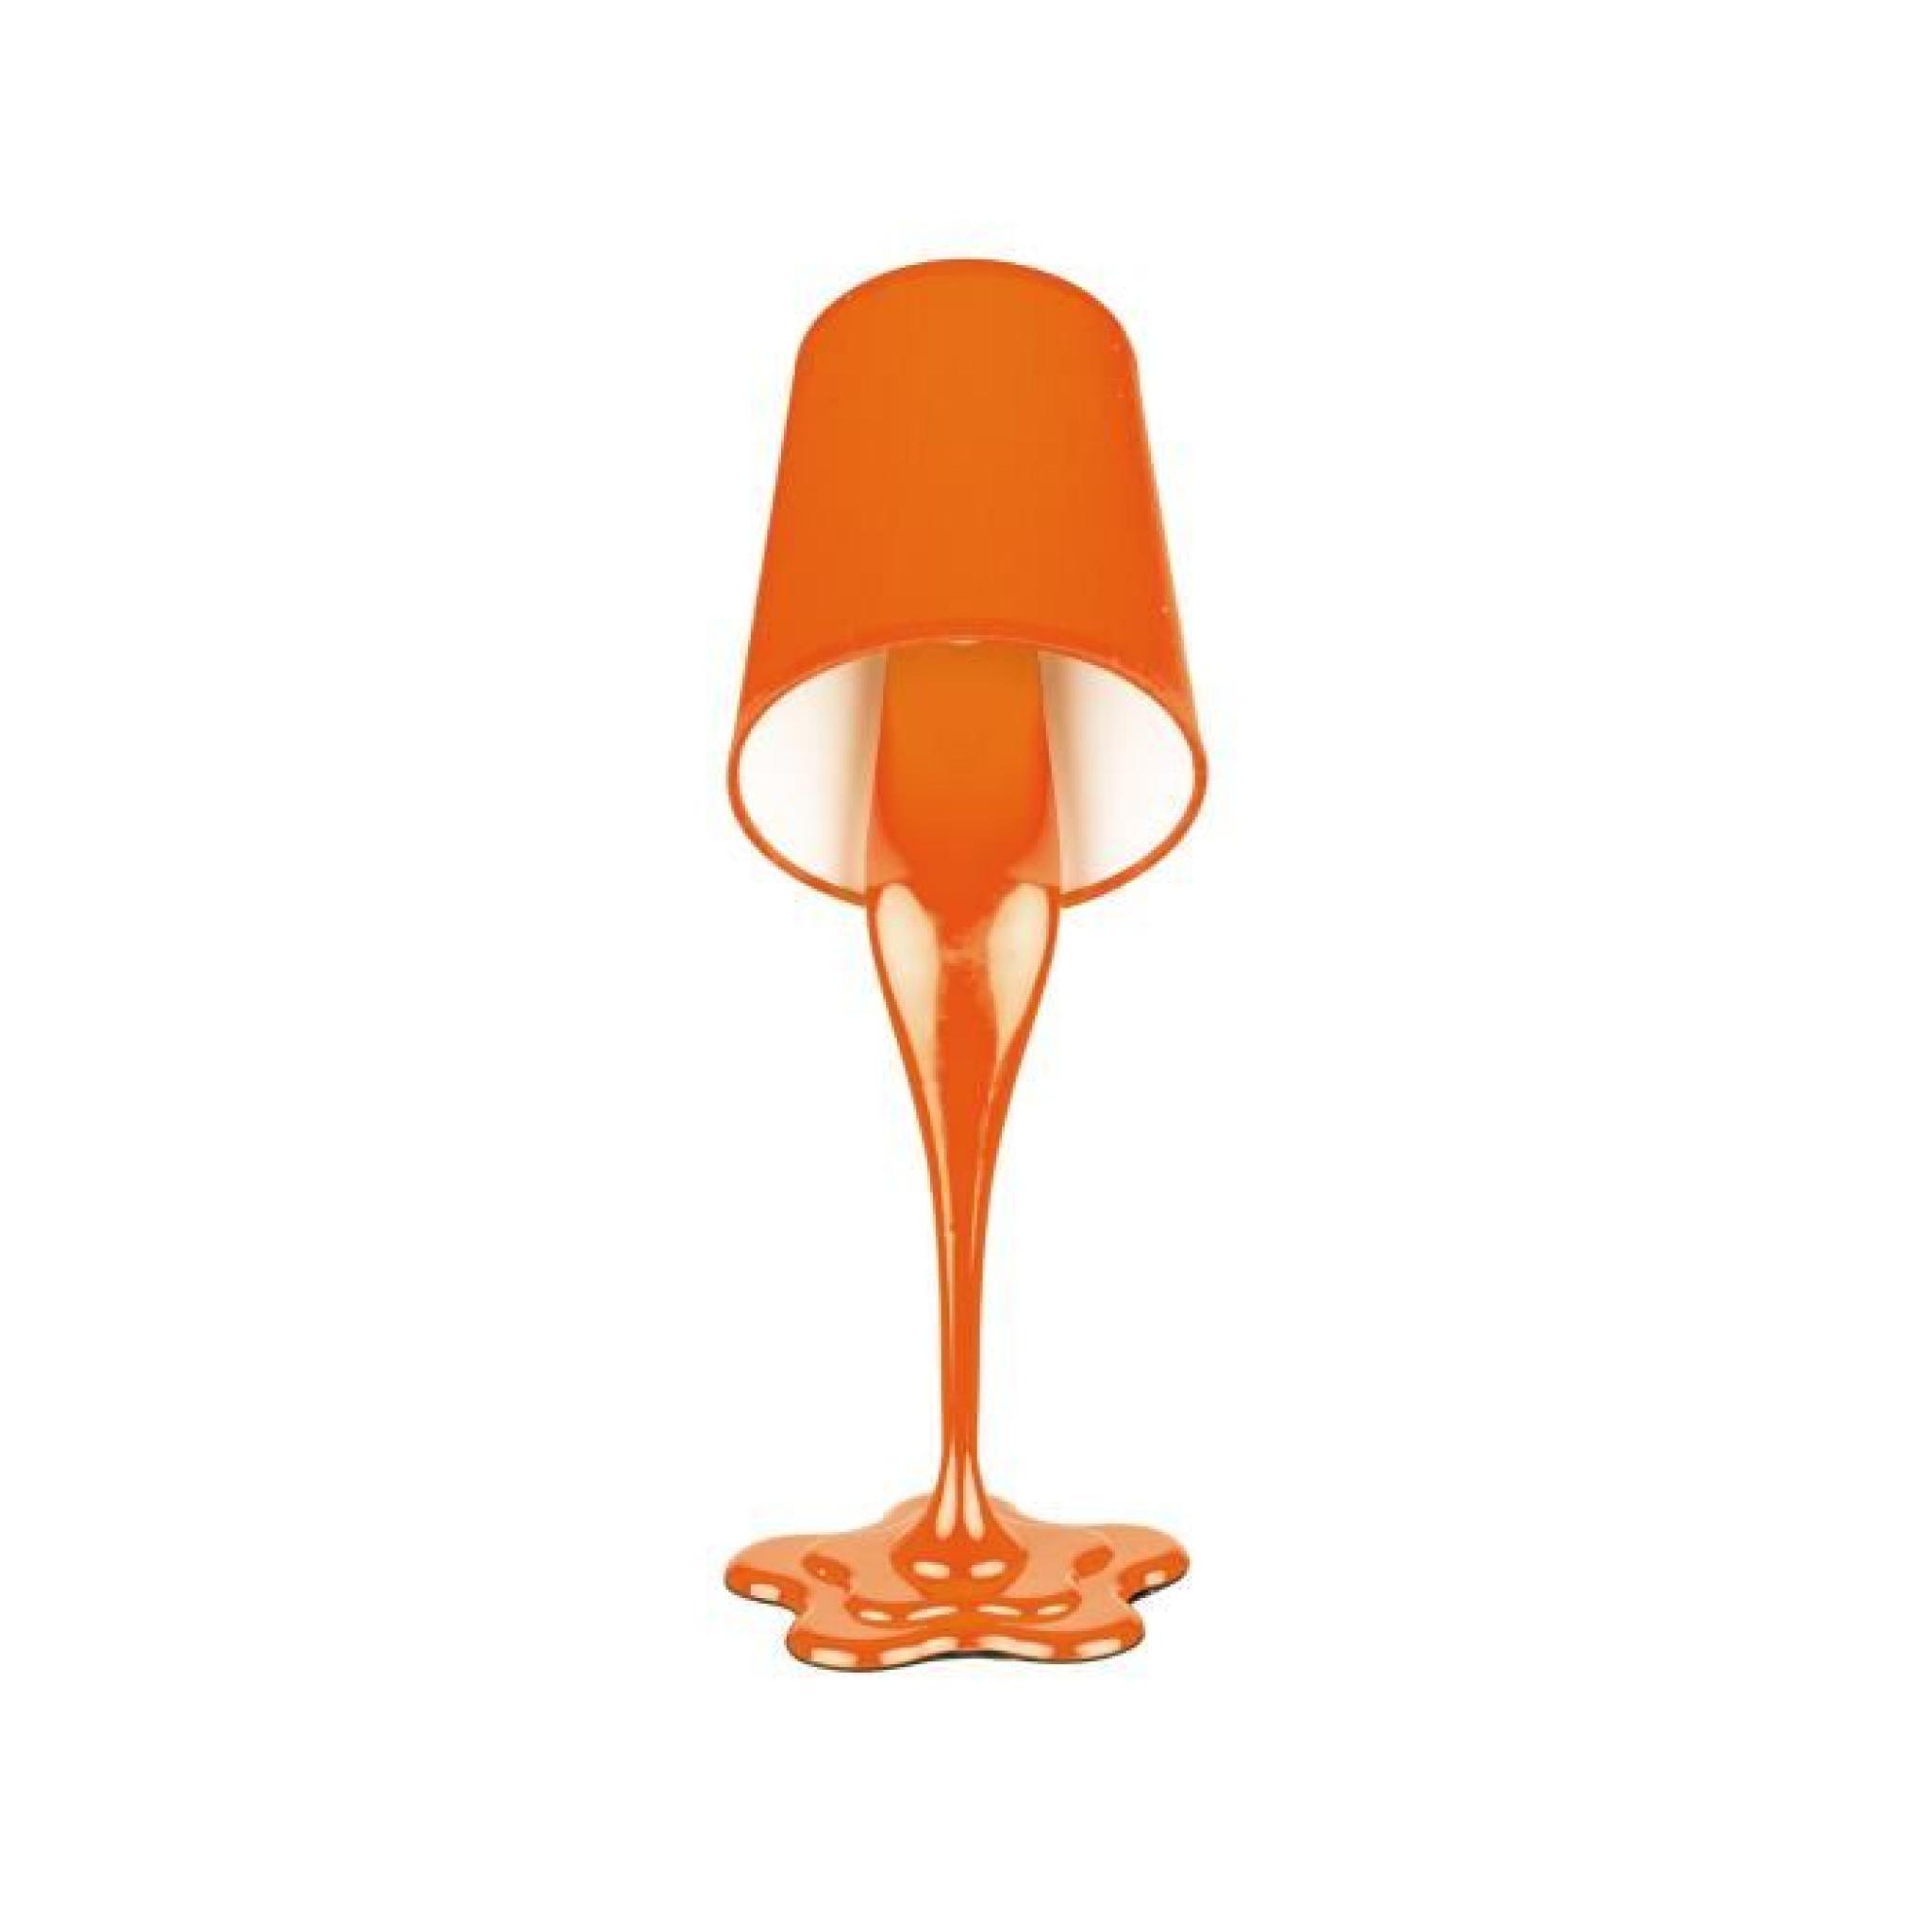 Pot De 36 Peinture Orangeh 5cm Lampe NP8nkXw0O